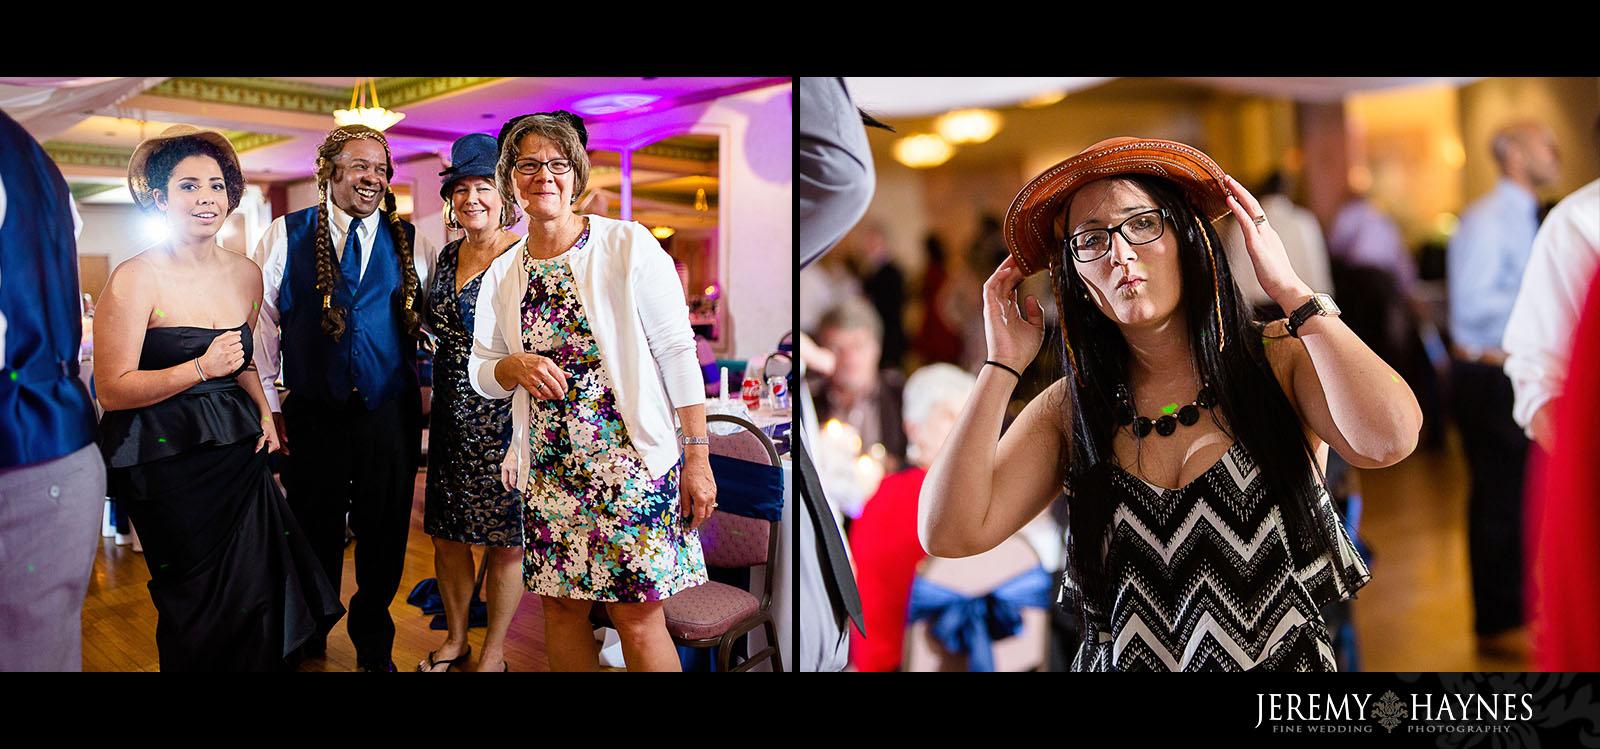 crazy-dance-reception-pictures